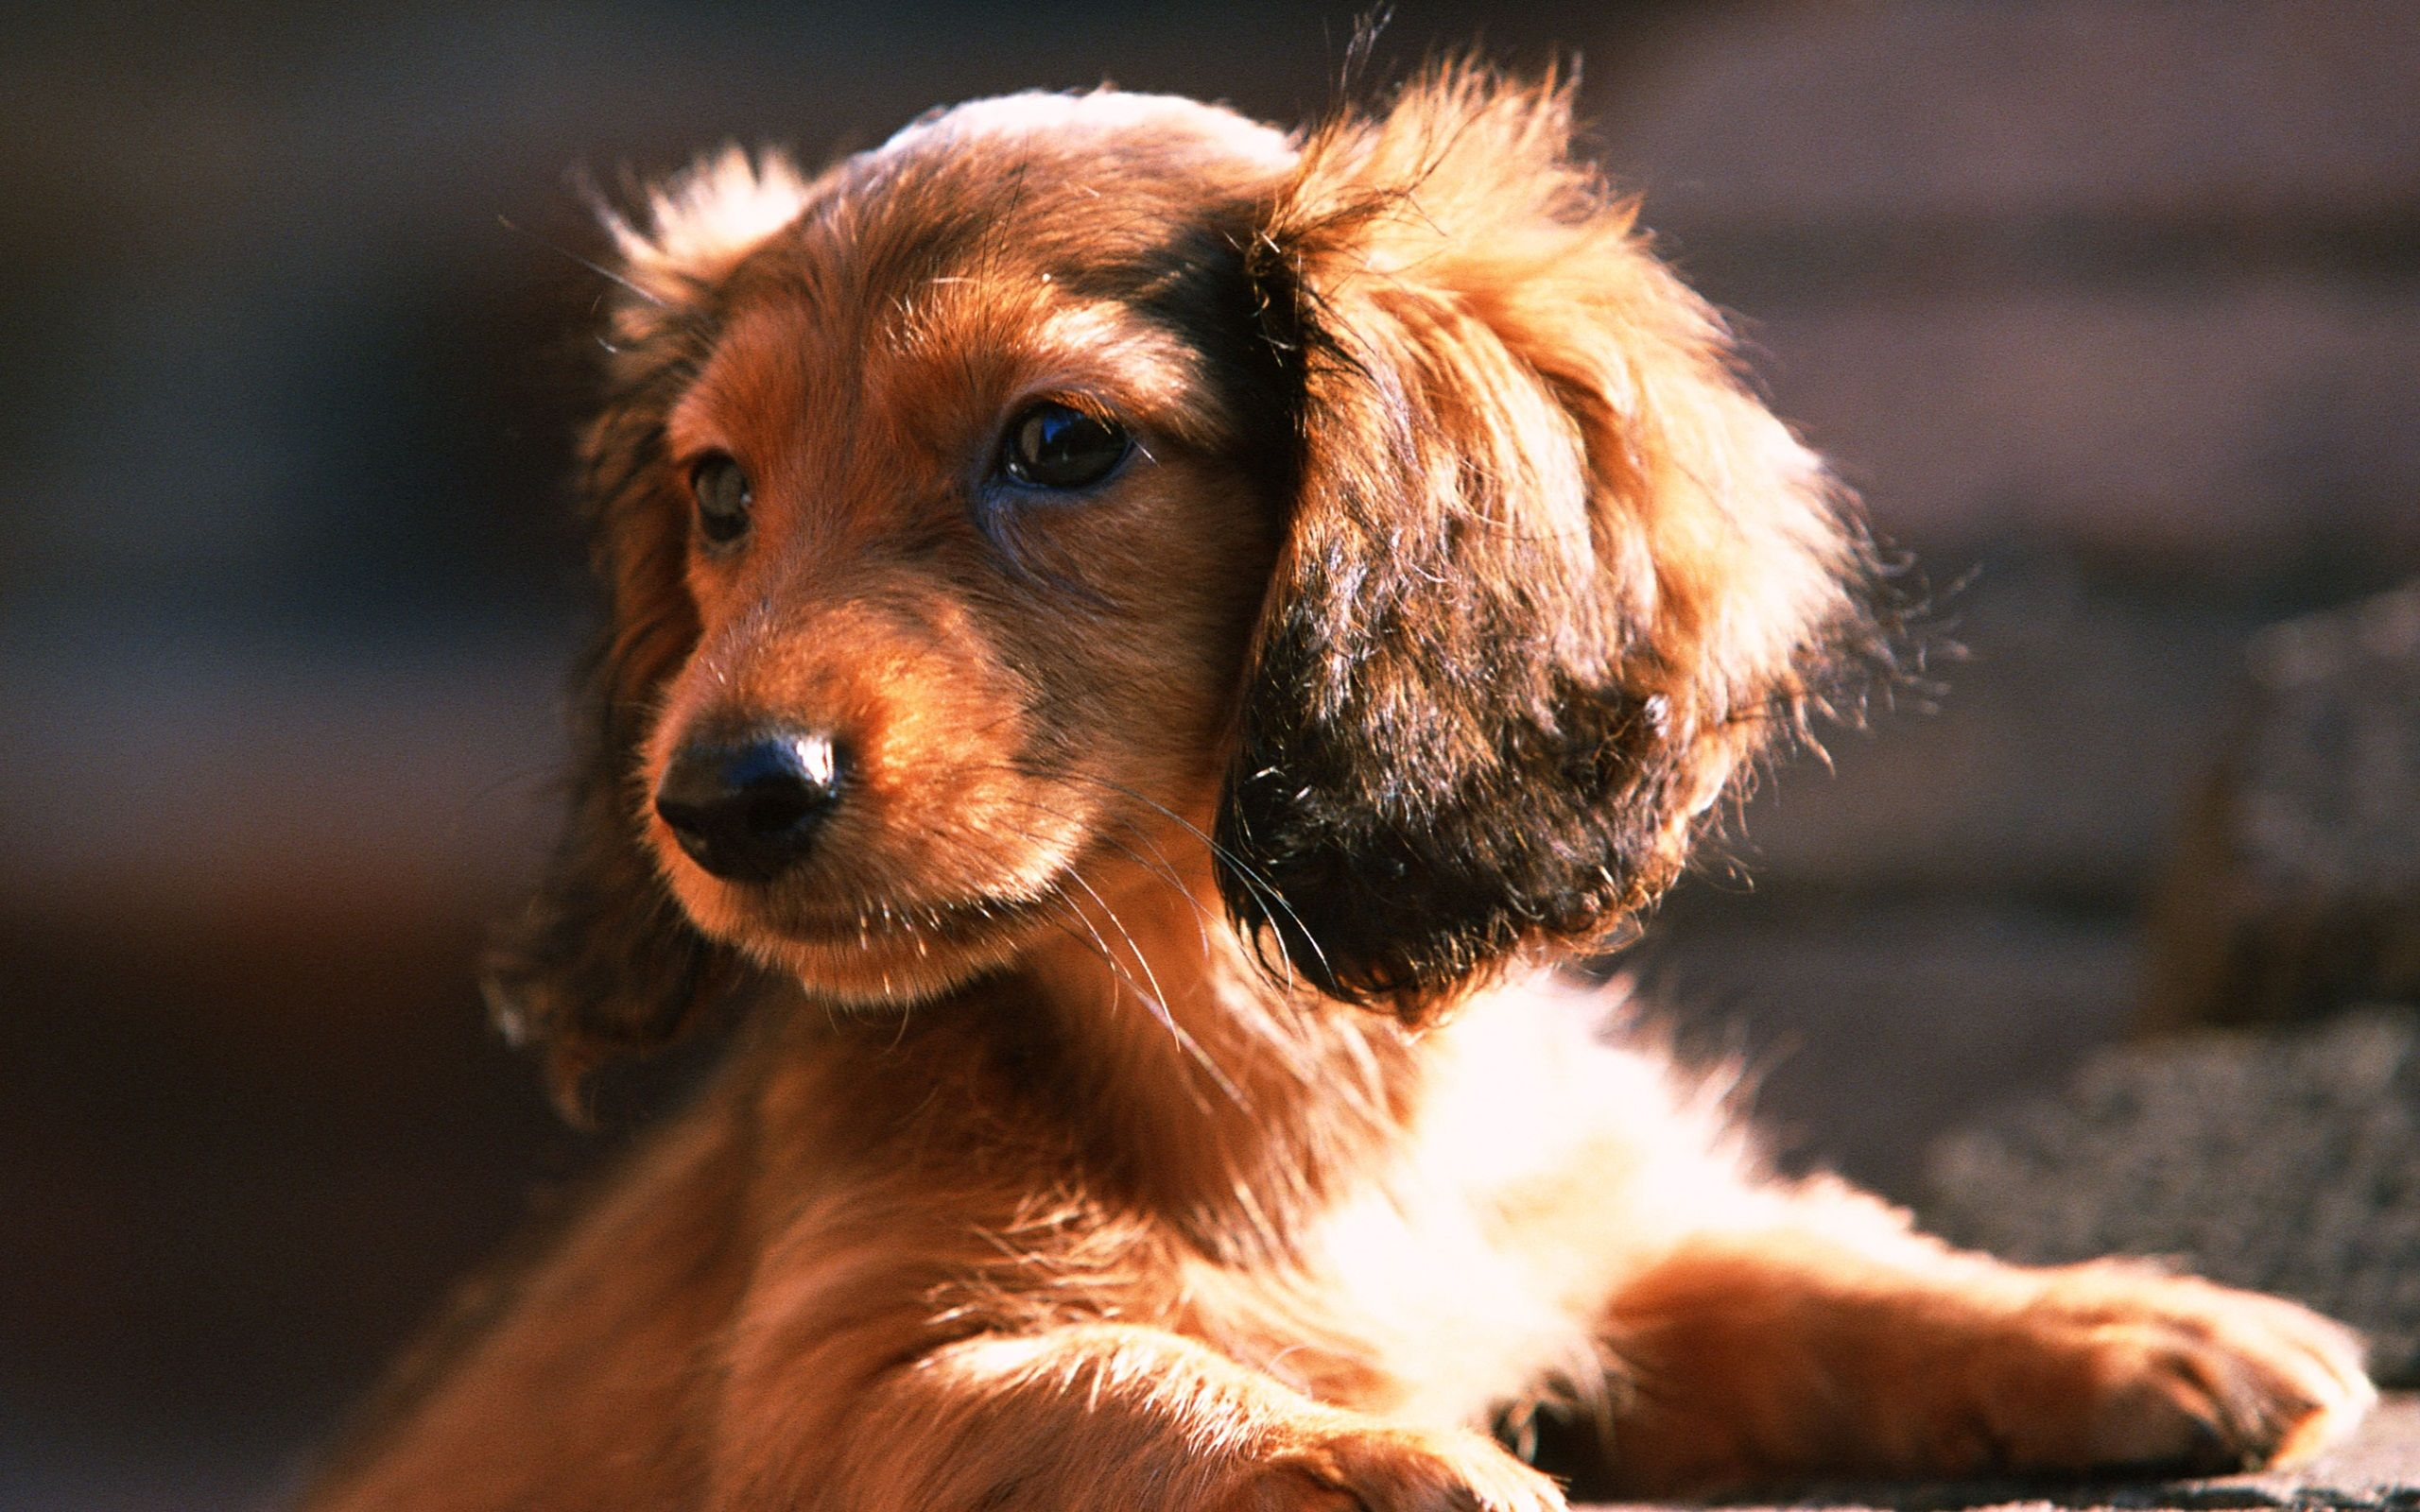 A Cute Dog With Big Ears Dachshund Puppy Dachshund Puppy Miniature